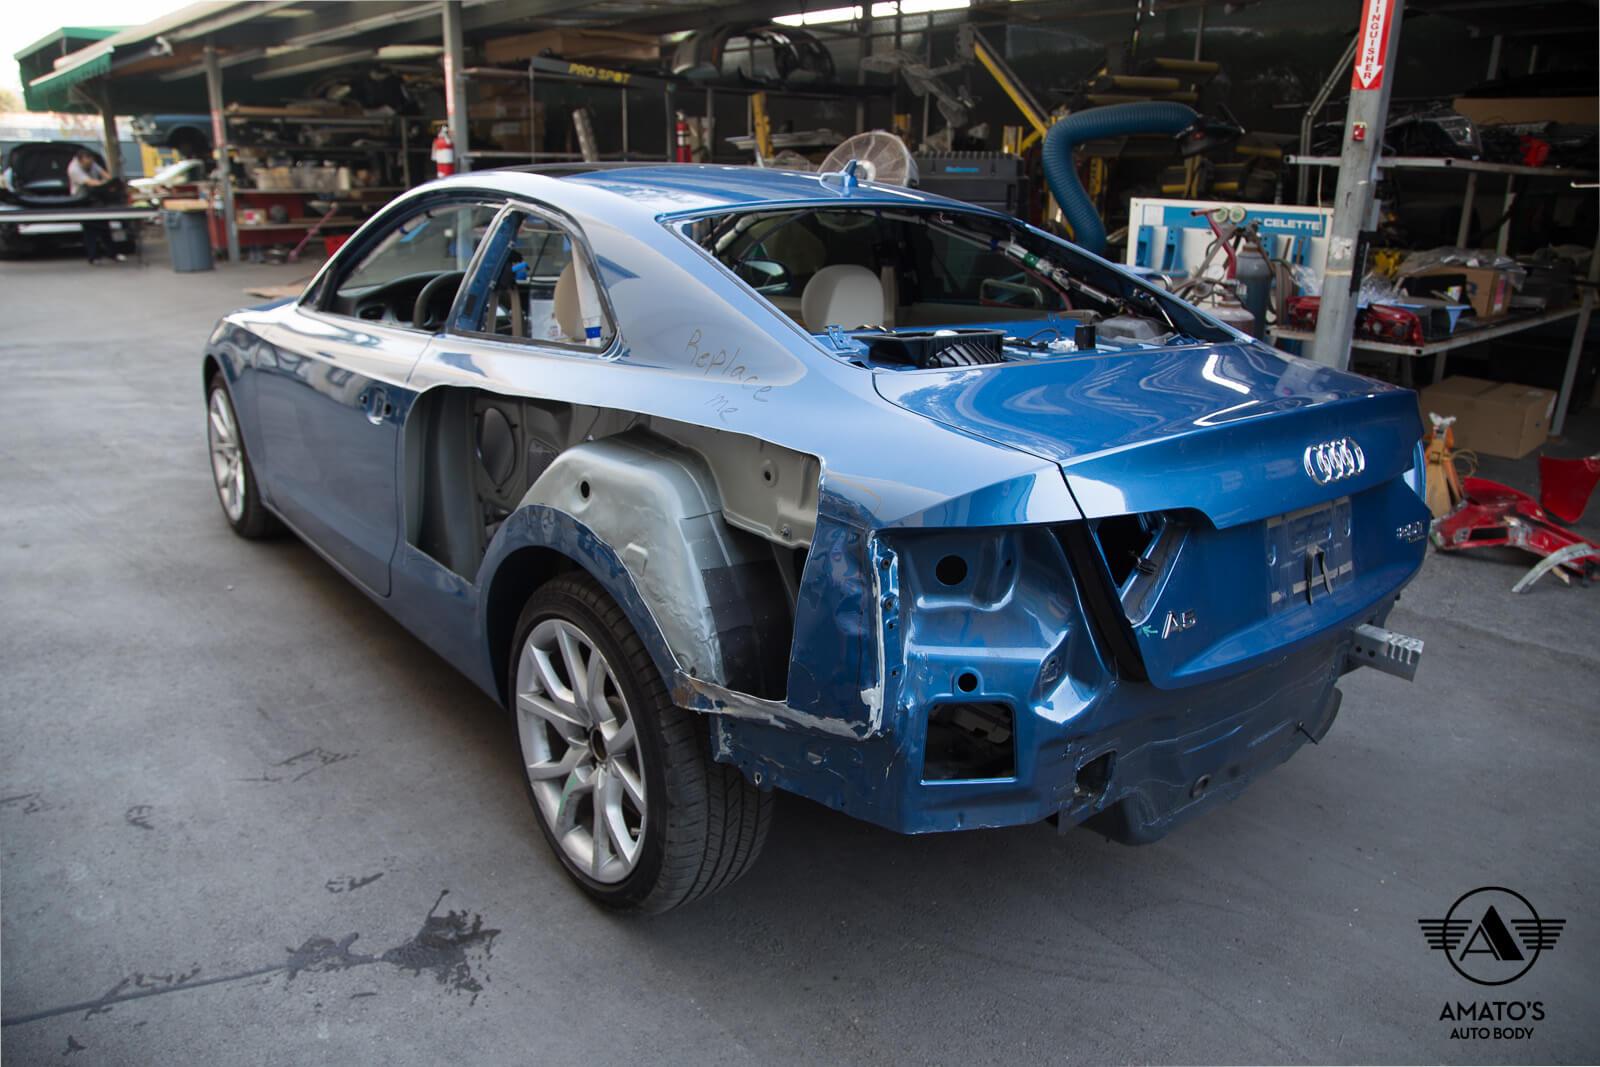 Audi Certification Amatos Auto Body - Audi certified collision repair